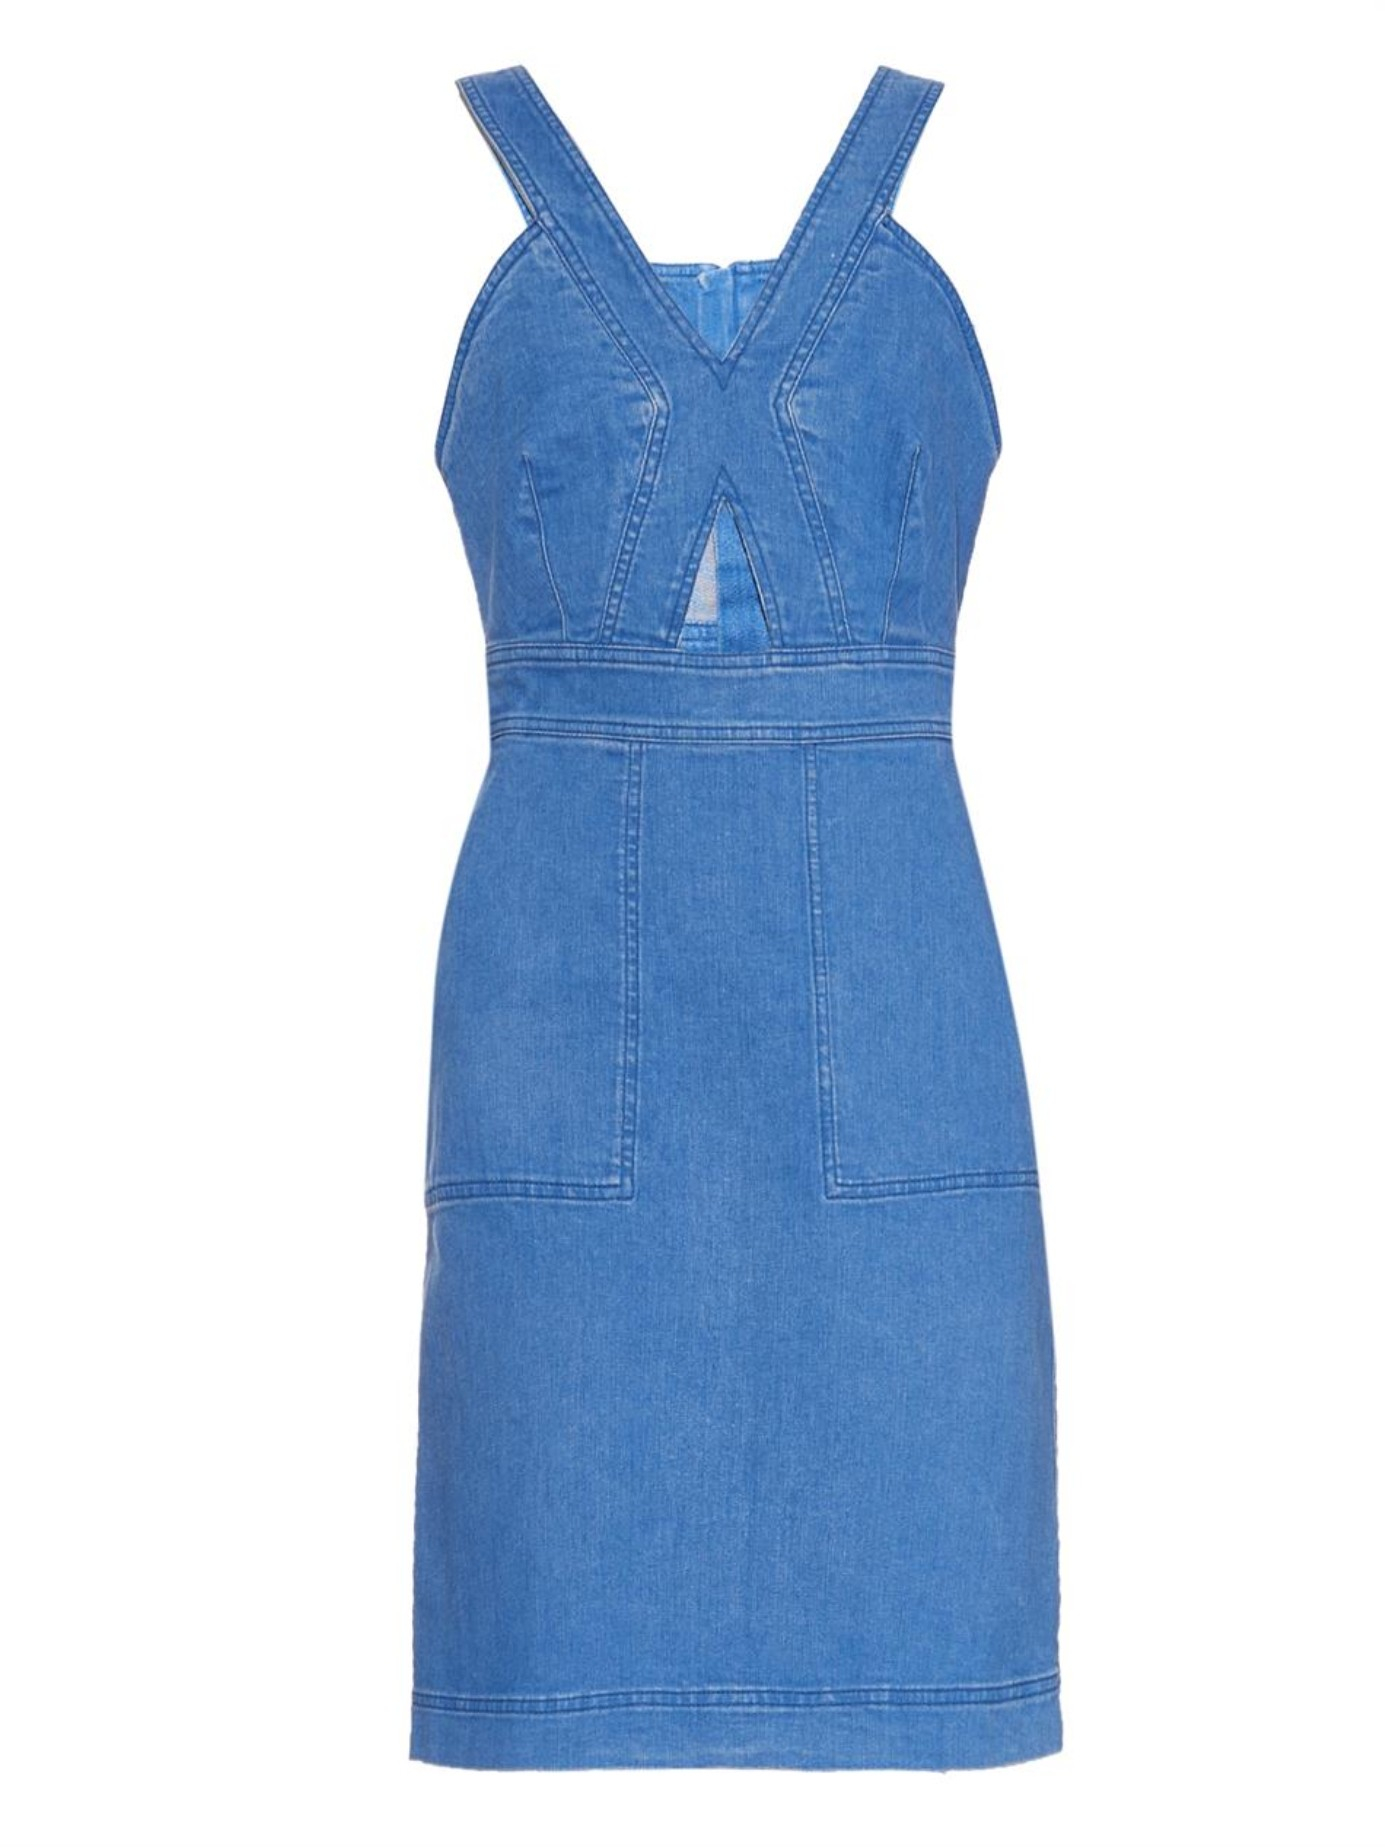 Stella Mccartney Woman Cutout Stretch-denim Dress Mid Denim Size 50 Stella McCartney nY2kEi6